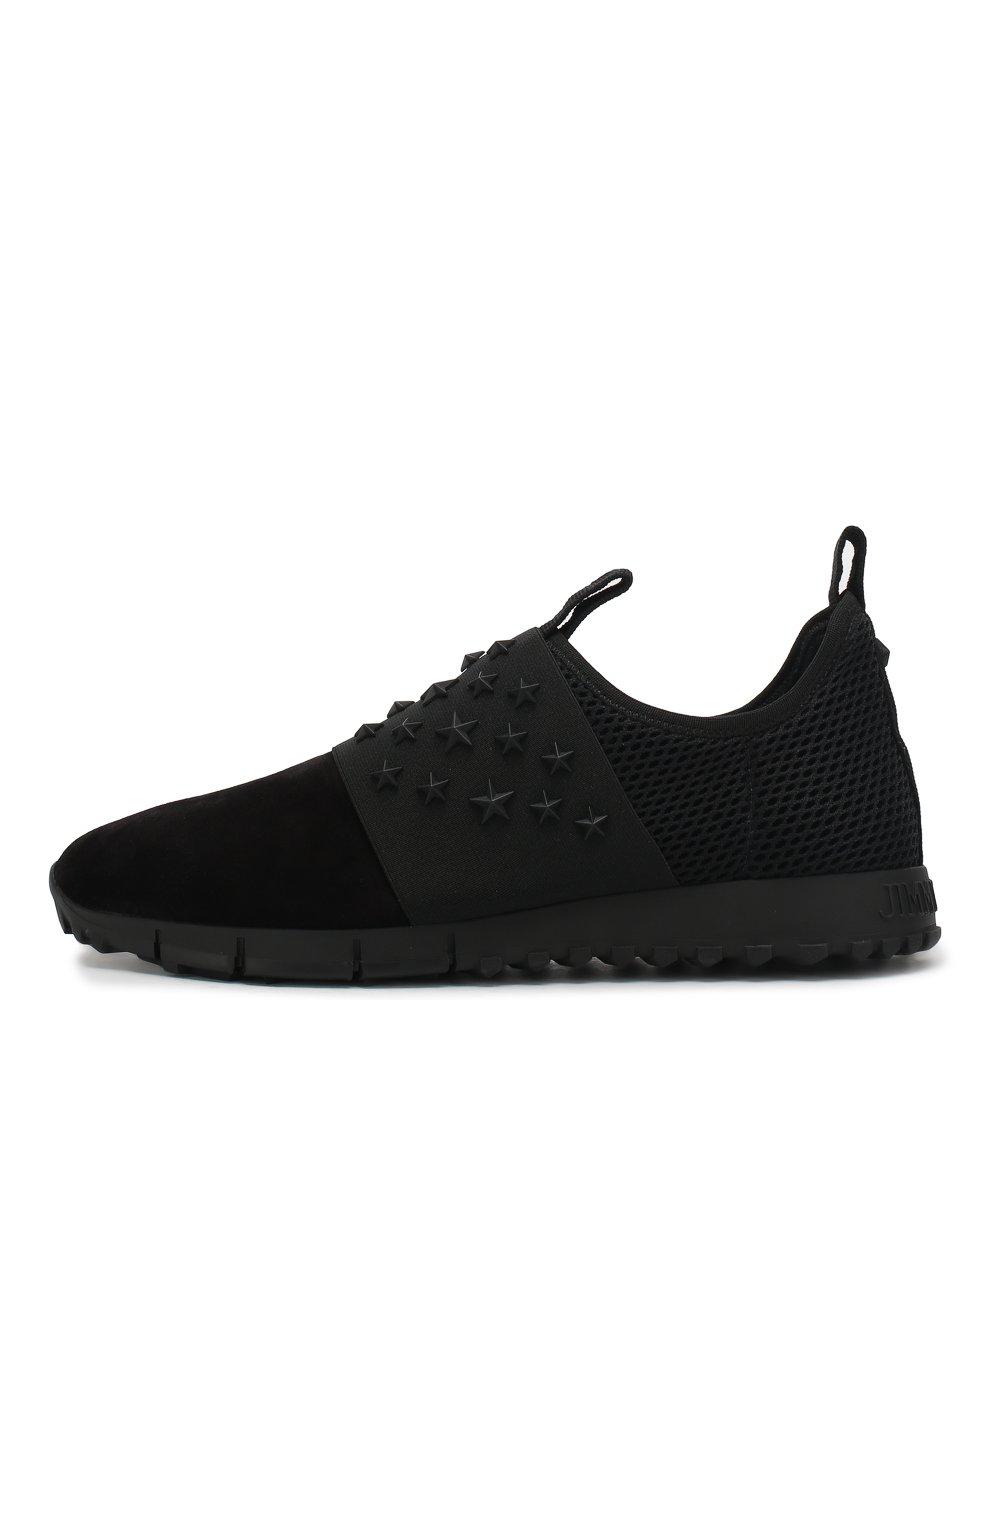 b8ab4b7b9ccb Мужская обувь Jimmy Choo по цене от 16 250 руб. купить в интернет-магазине  ЦУМ